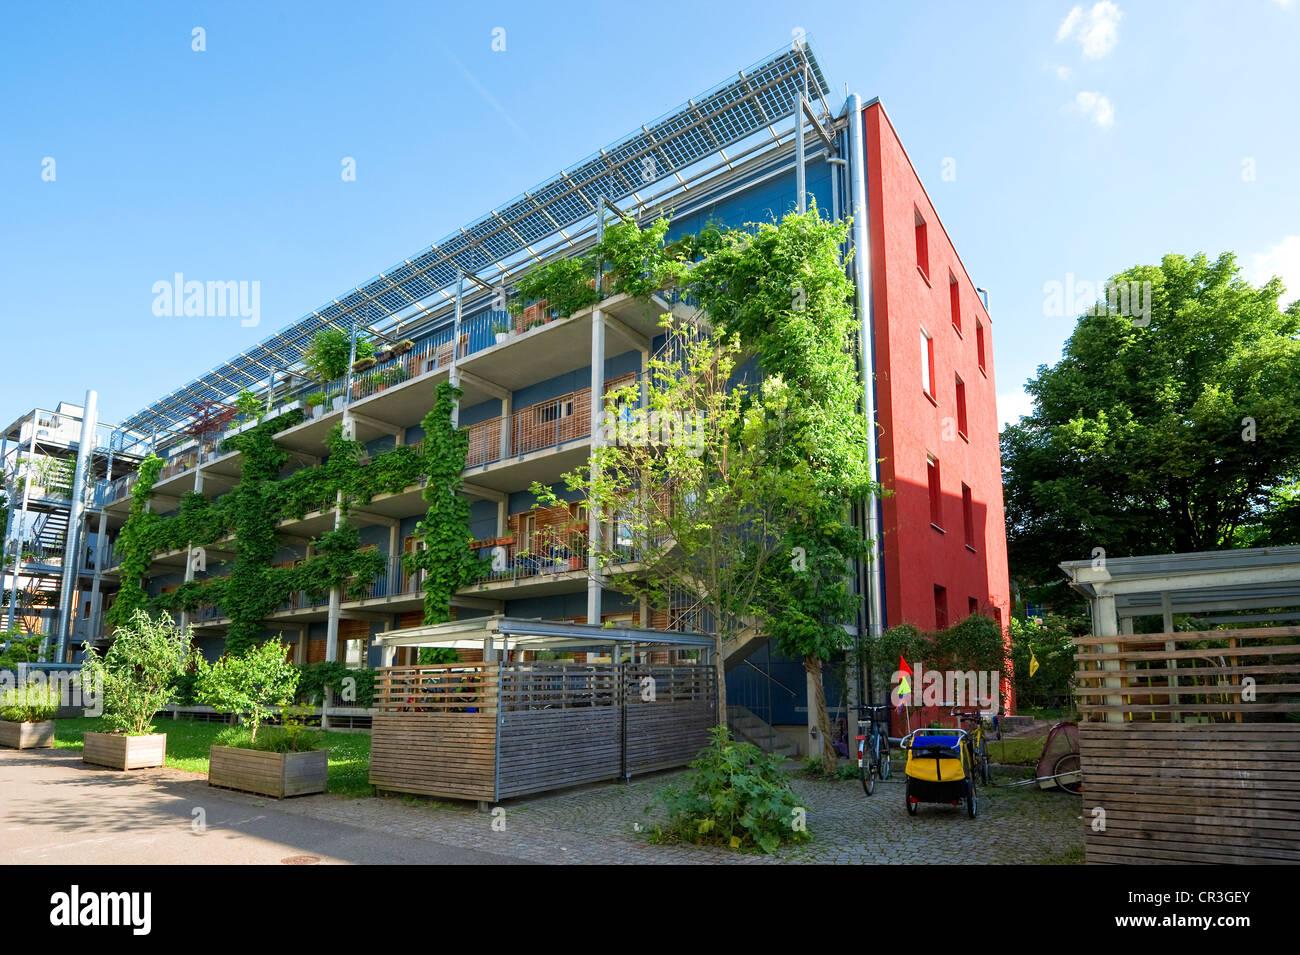 Passive house, Vauban district, Freiburg im Breisgau, Baden-Wuerttemberg, Germany, Europe - Stock Image